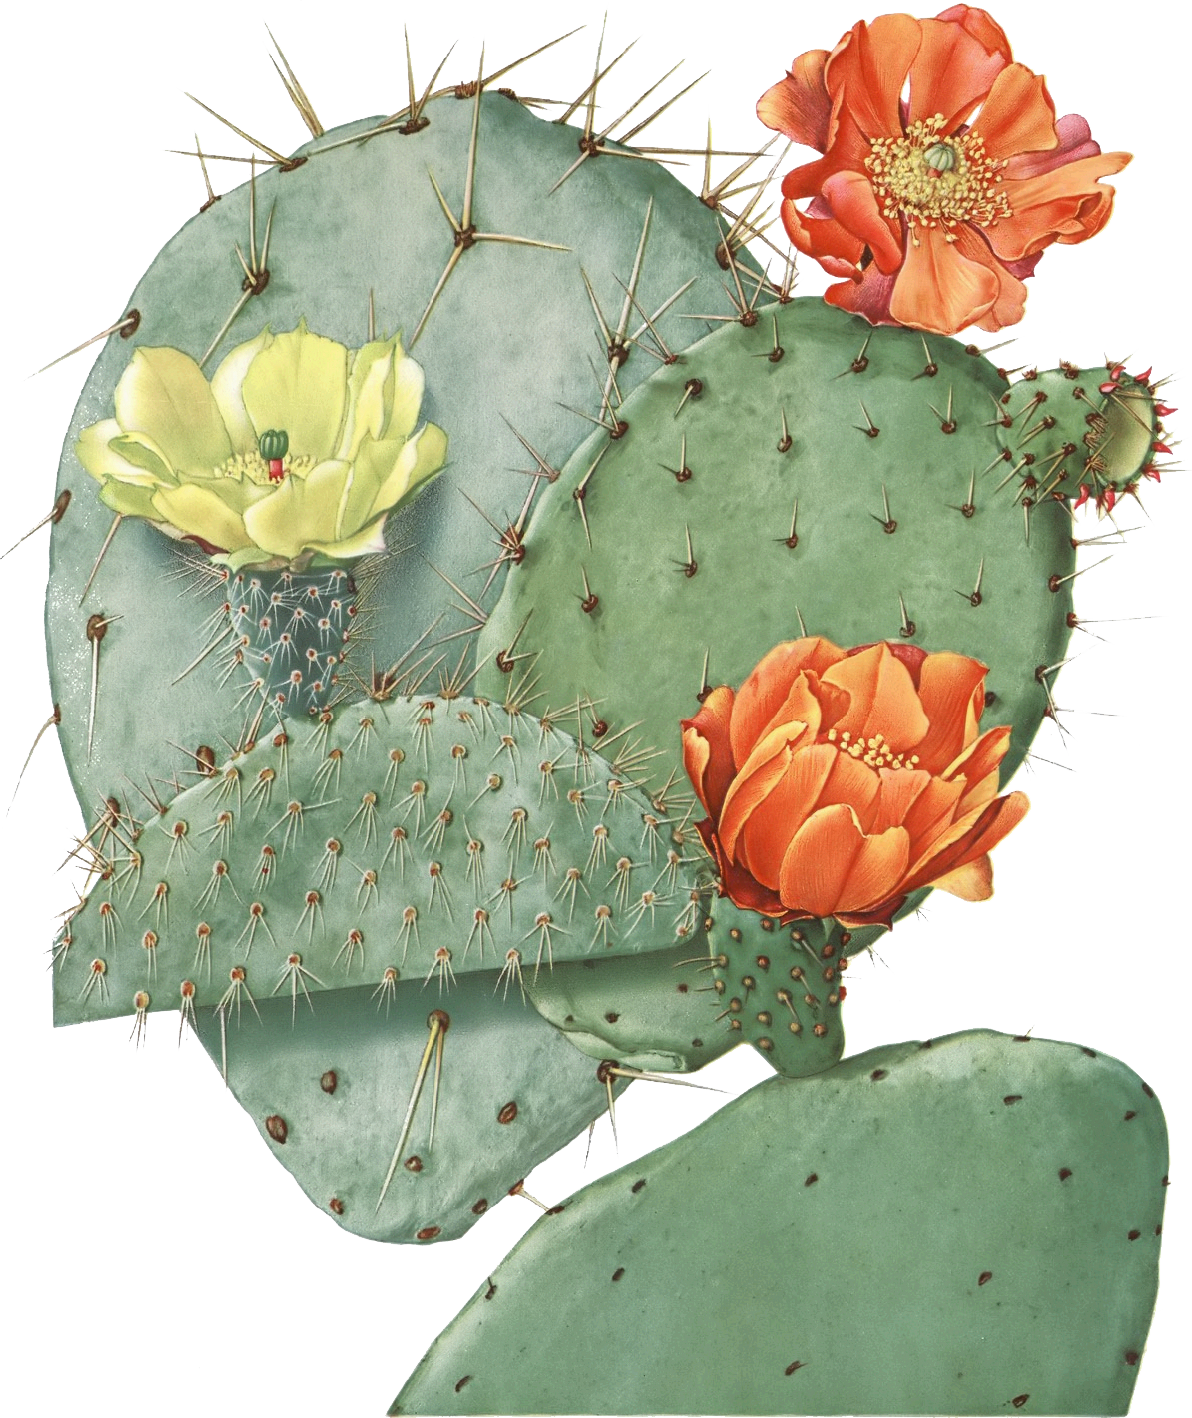 Cactus art cactus flower cactus drawing cactus illustration illustration fashion nature